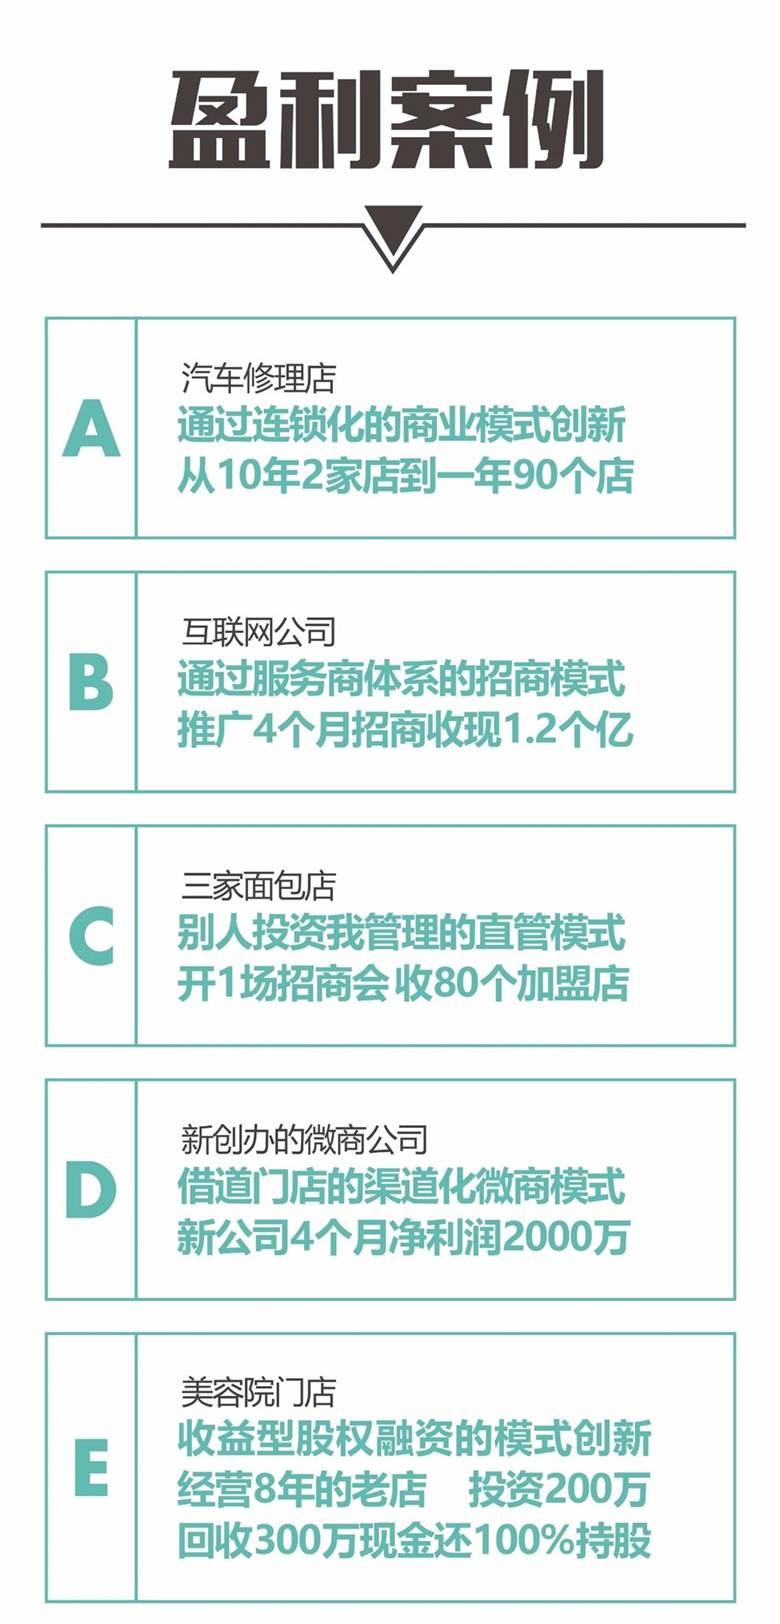 http://www.huodongxing.com/file/20191113/1063603644976/213660702060460.jpg